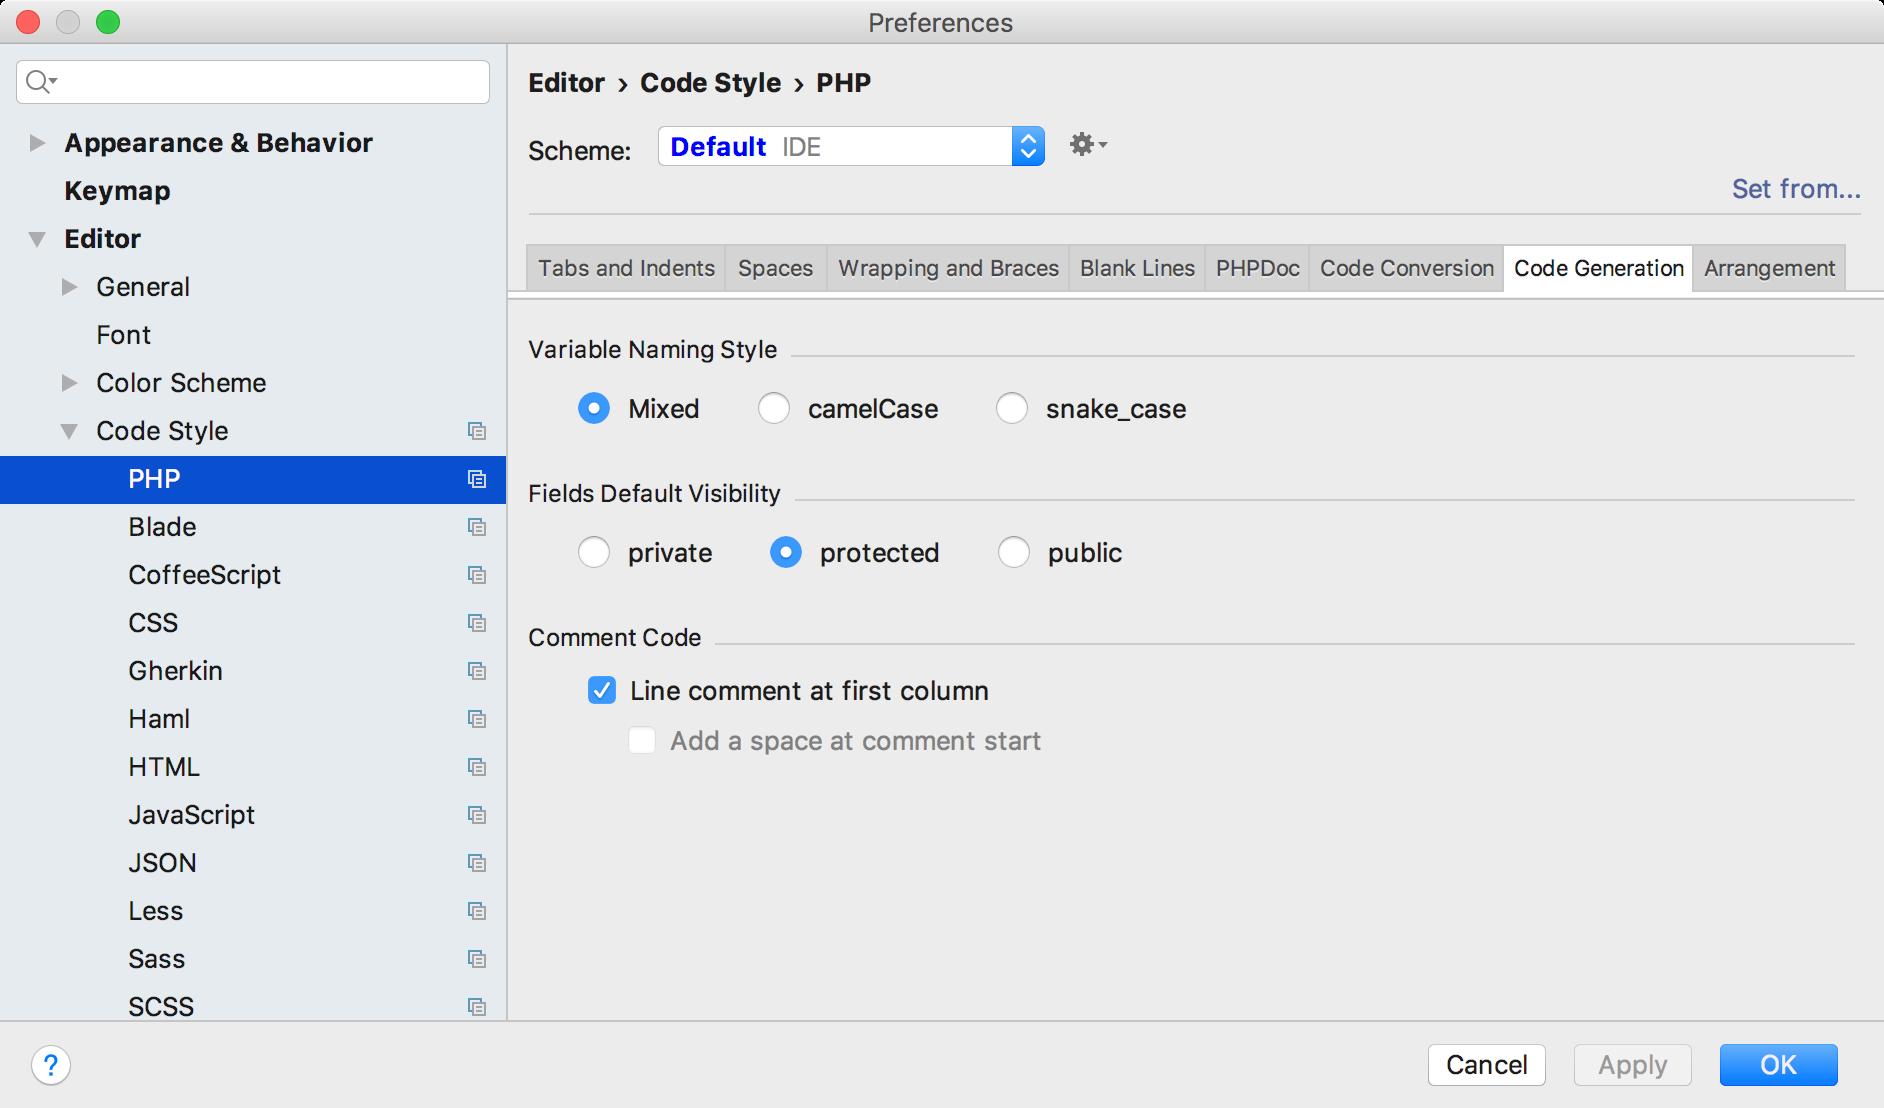 fields-default-visibility